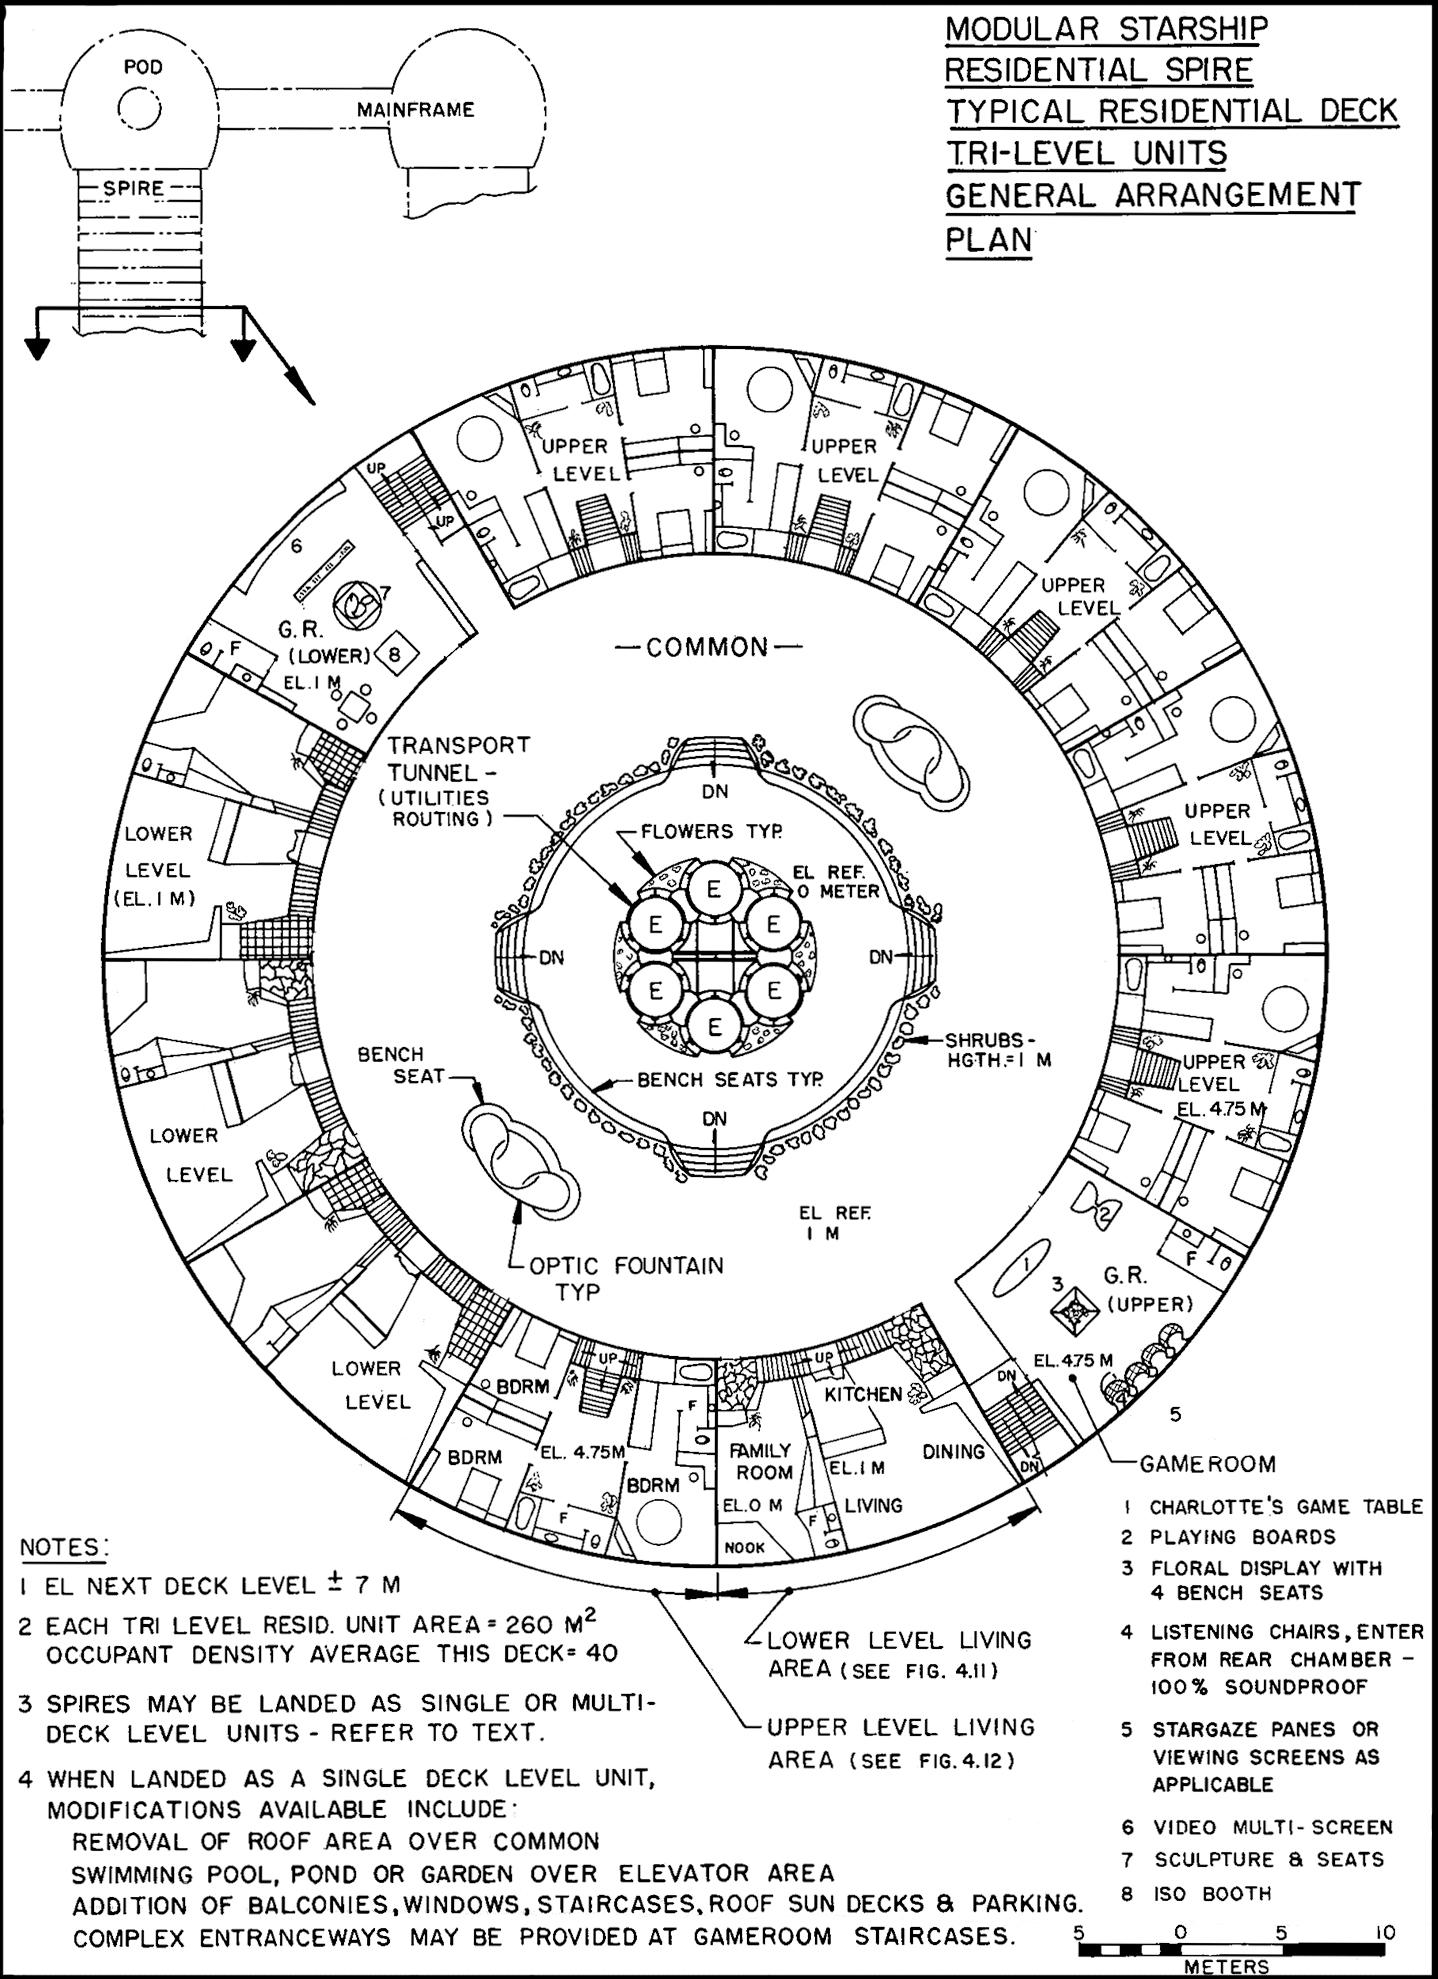 starship floor plan generator www galleryhip com the star wars starship floor plans google search star wars